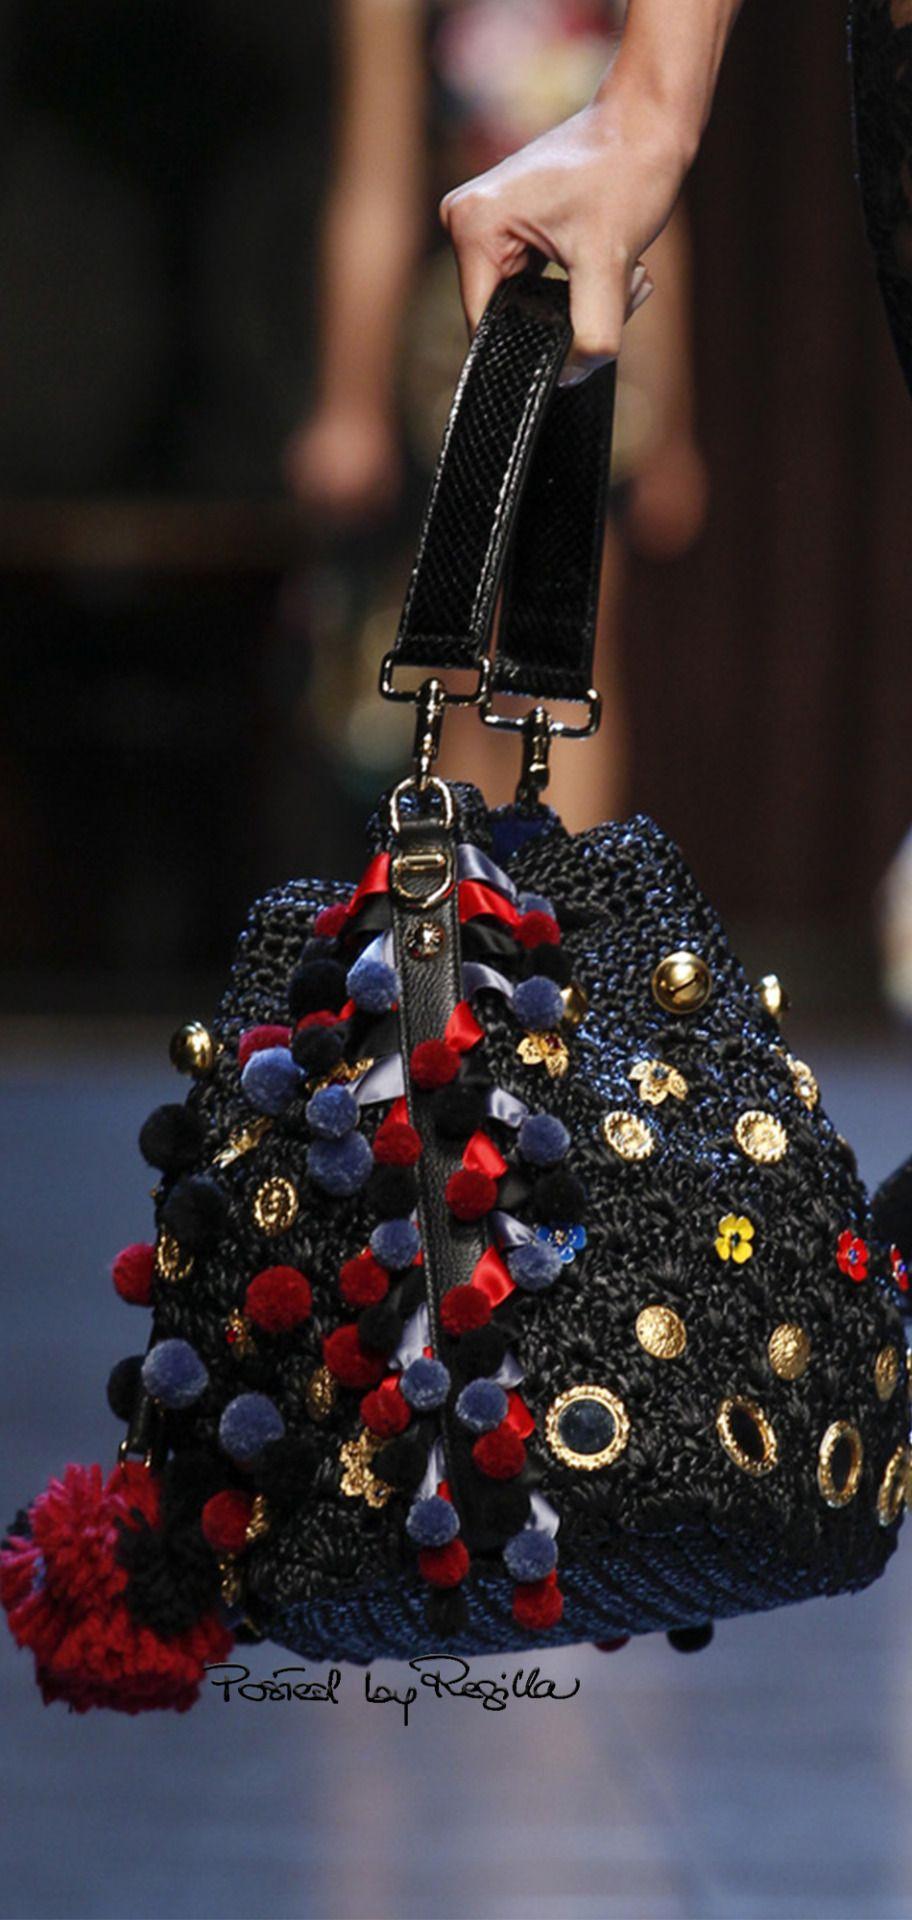 Regilla ⚜ Dolce Gabbana, SS 2016 Clothing, Shoes & Jewelry : Women : Handbags & Wallets : handbags for women http://amzn.to/2jUCm9A